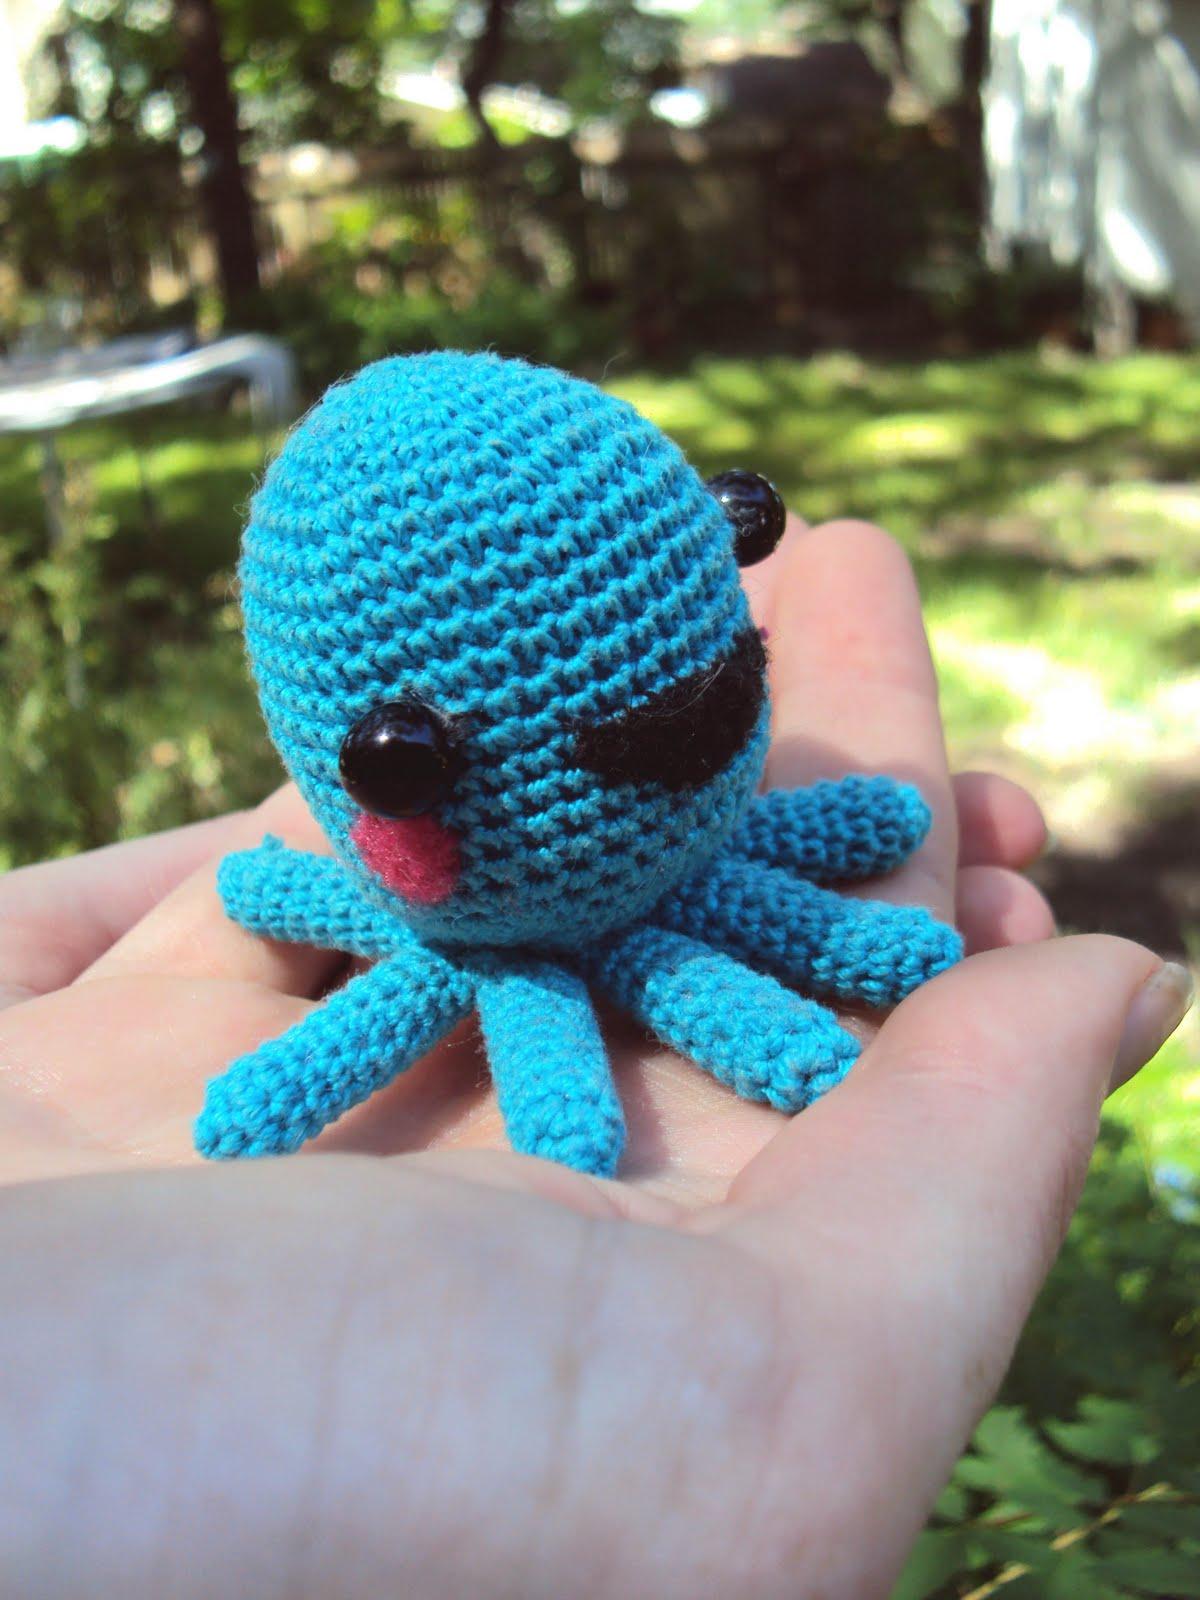 Amigurumi World Seriously Cute Crochet By Ana Paula 2017 ...